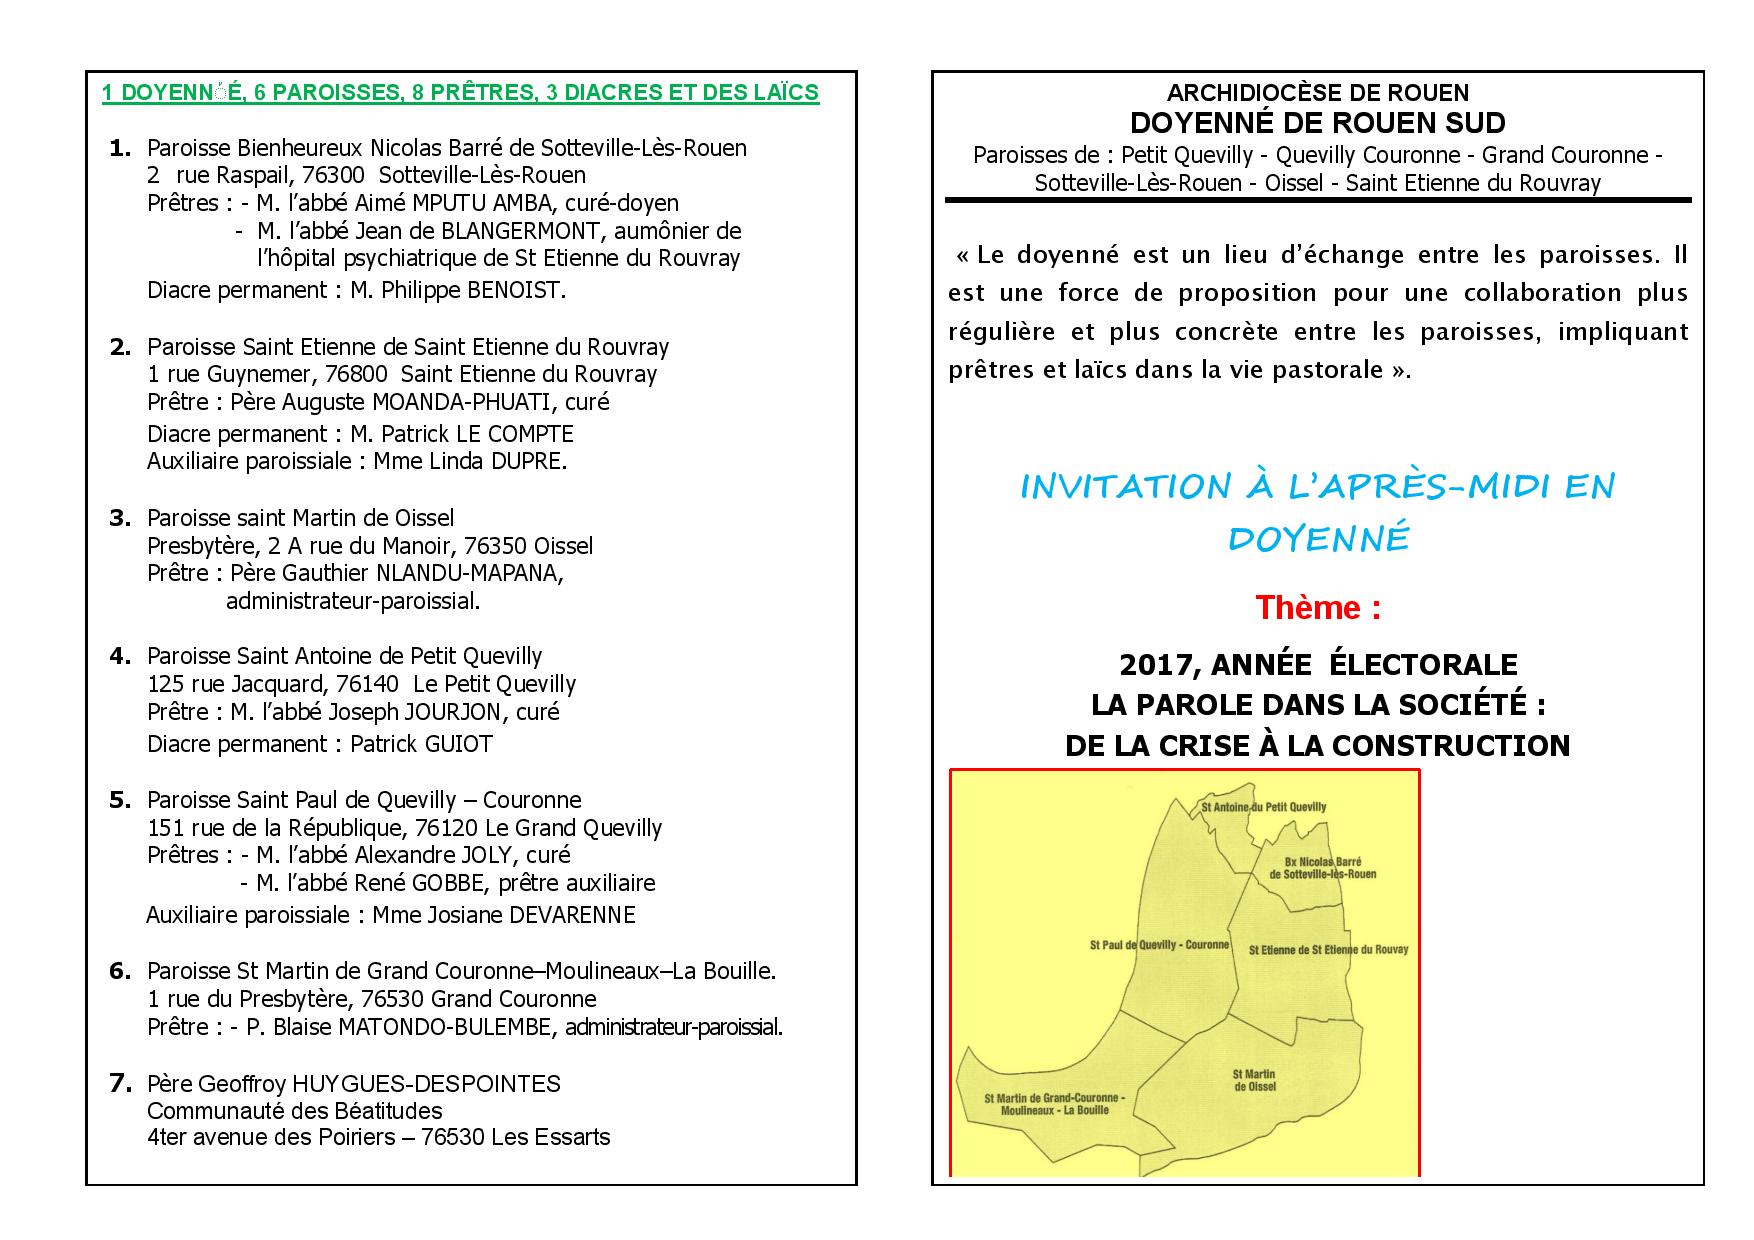 Invitation 1 laïcs 2017-03-25-Bénévoles doyenné Essarts-1-page-001